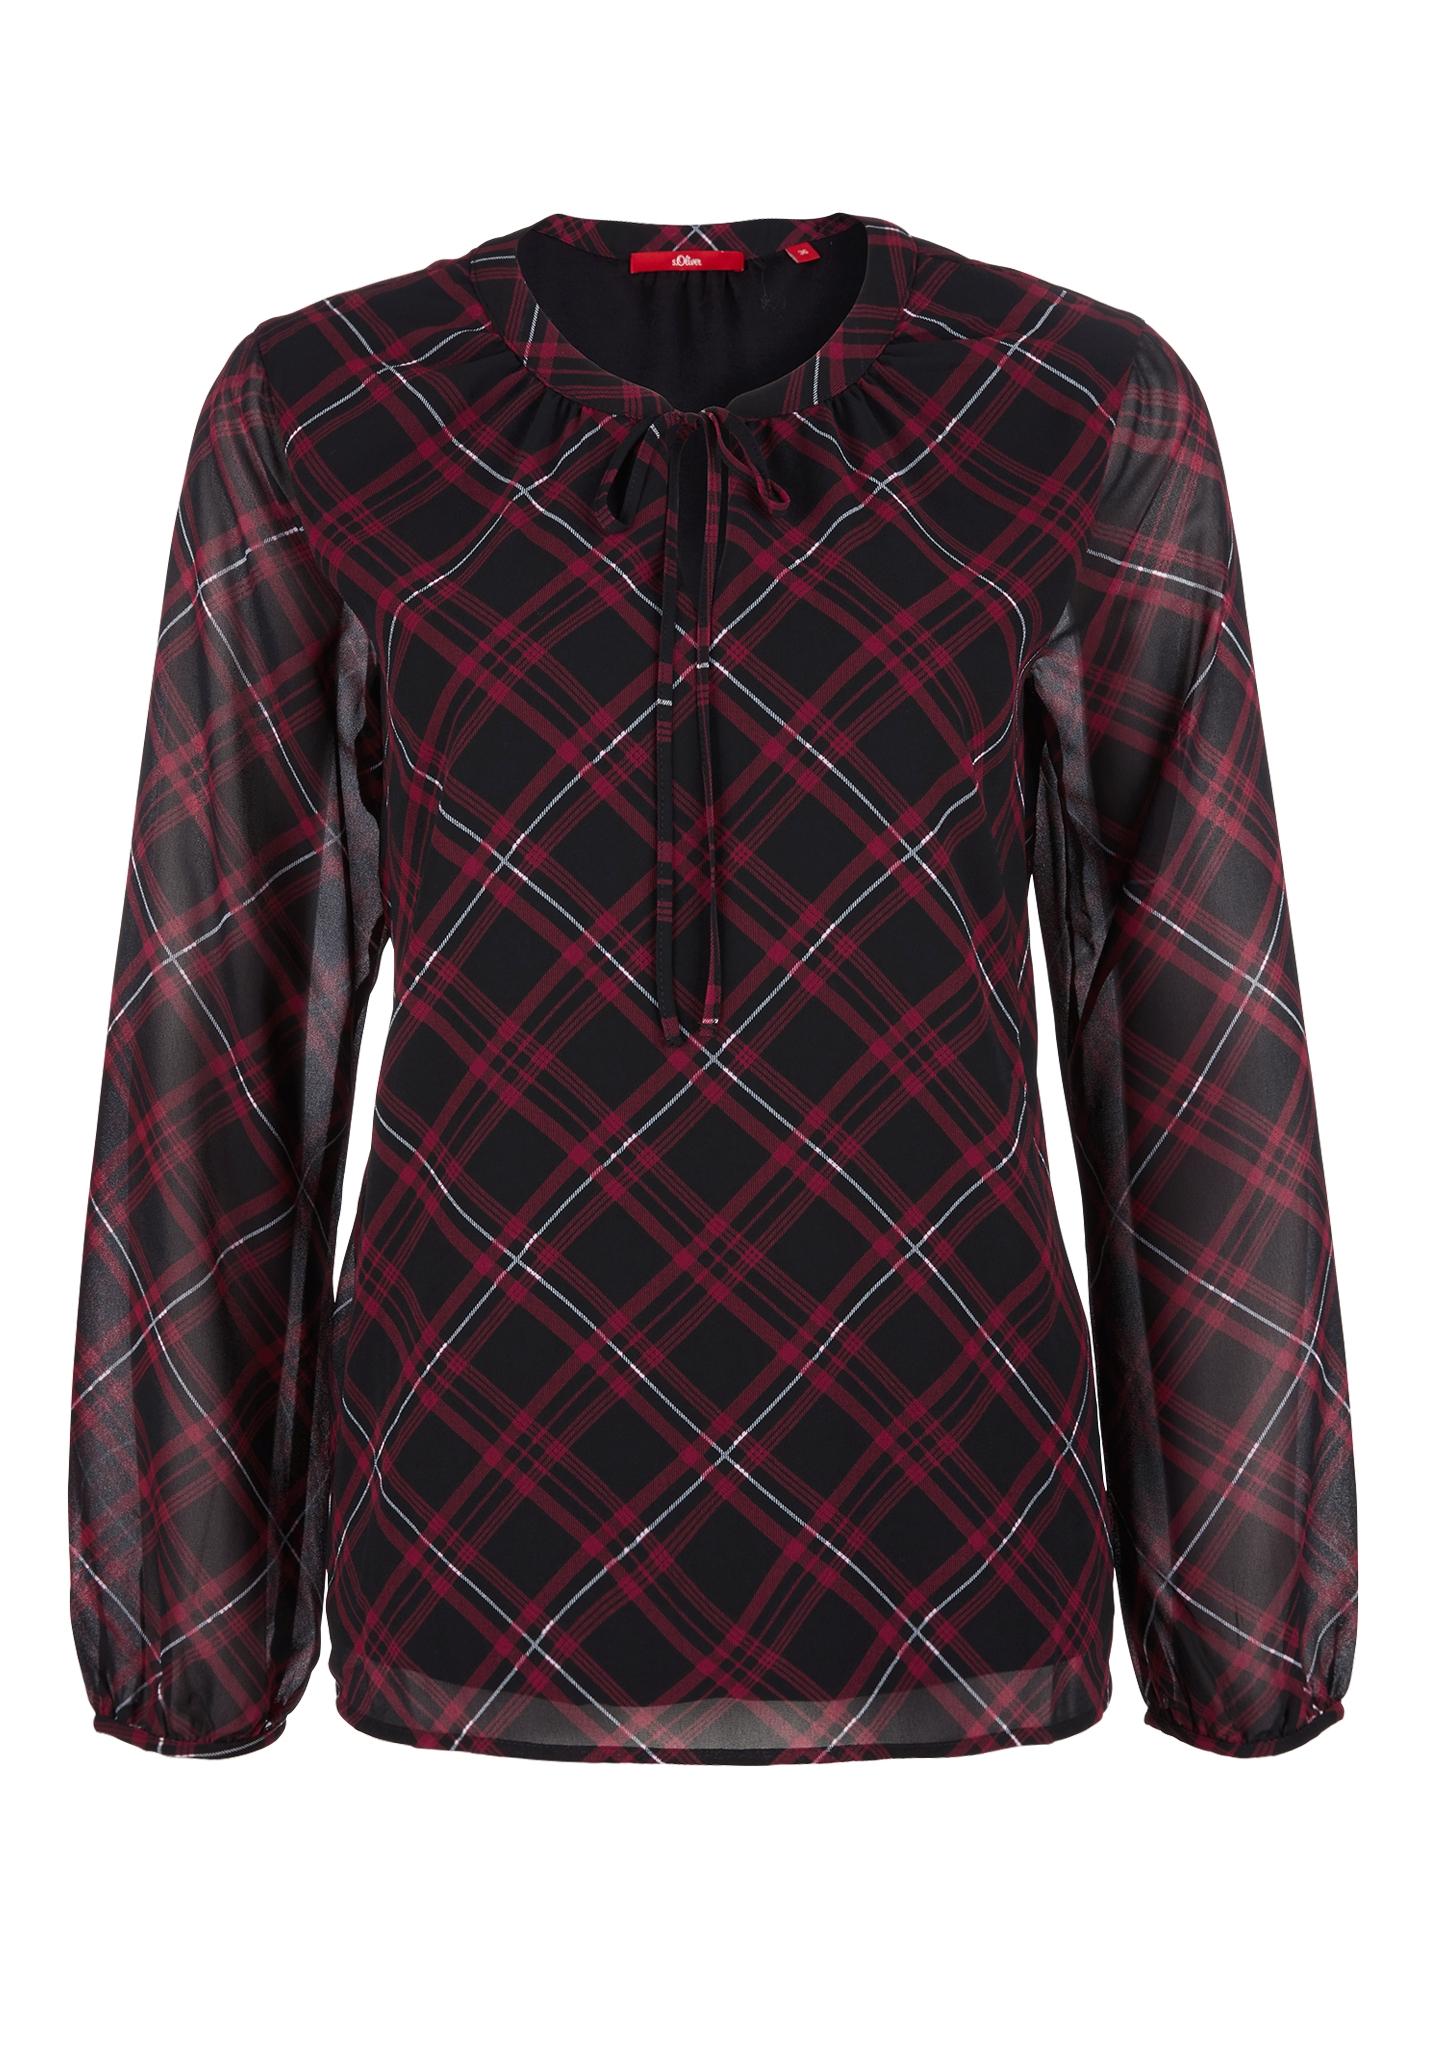 Chiffon-Blusenshirt | Bekleidung > Blusen > Chiffonblusen | Rot | Obermaterial 100% polyester| futter 100% viskose | s.Oliver